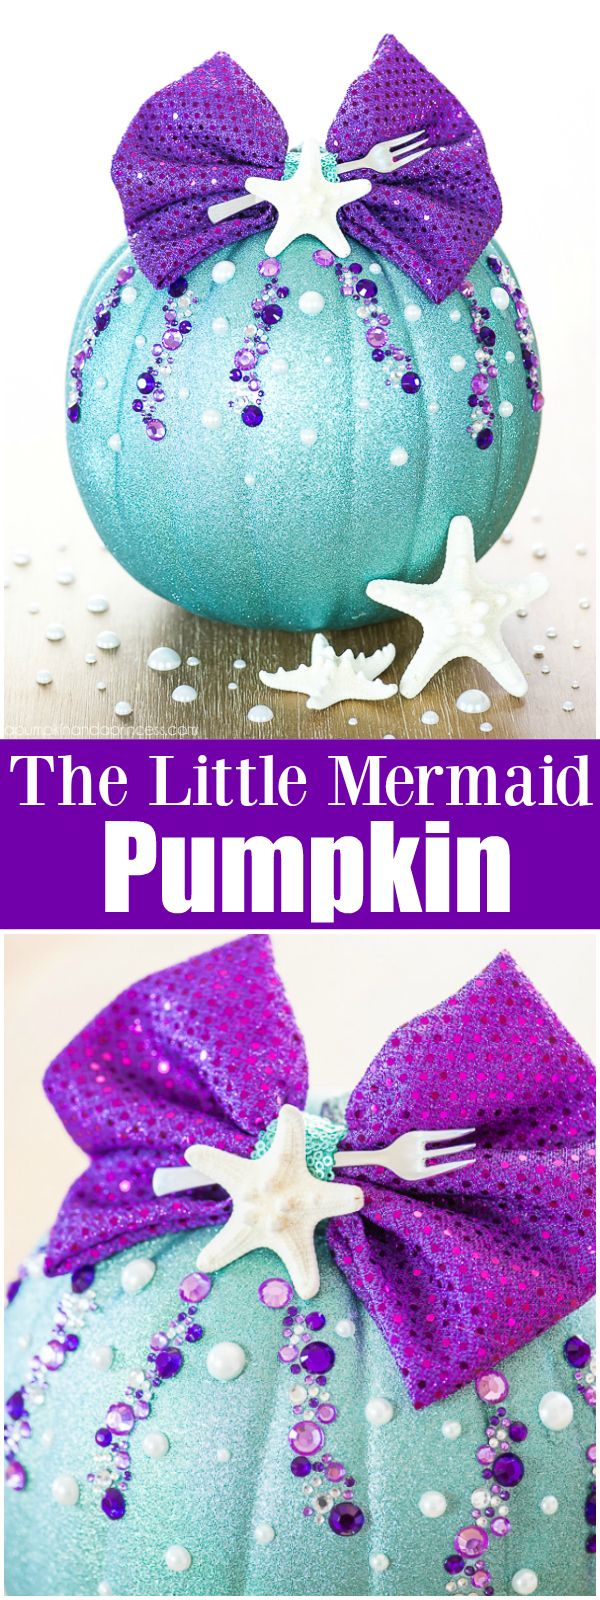 DIY No-Carve Little Mermaid Pumpkin – how to make a Disney Ariel inspired pumpkin with glitter, pearls, seashells and a mini fork to complete your under the sea creation. - unique pumpkins - fall decor - kids room fall - princess crafts - princess pumpkin - Disney pumpkin